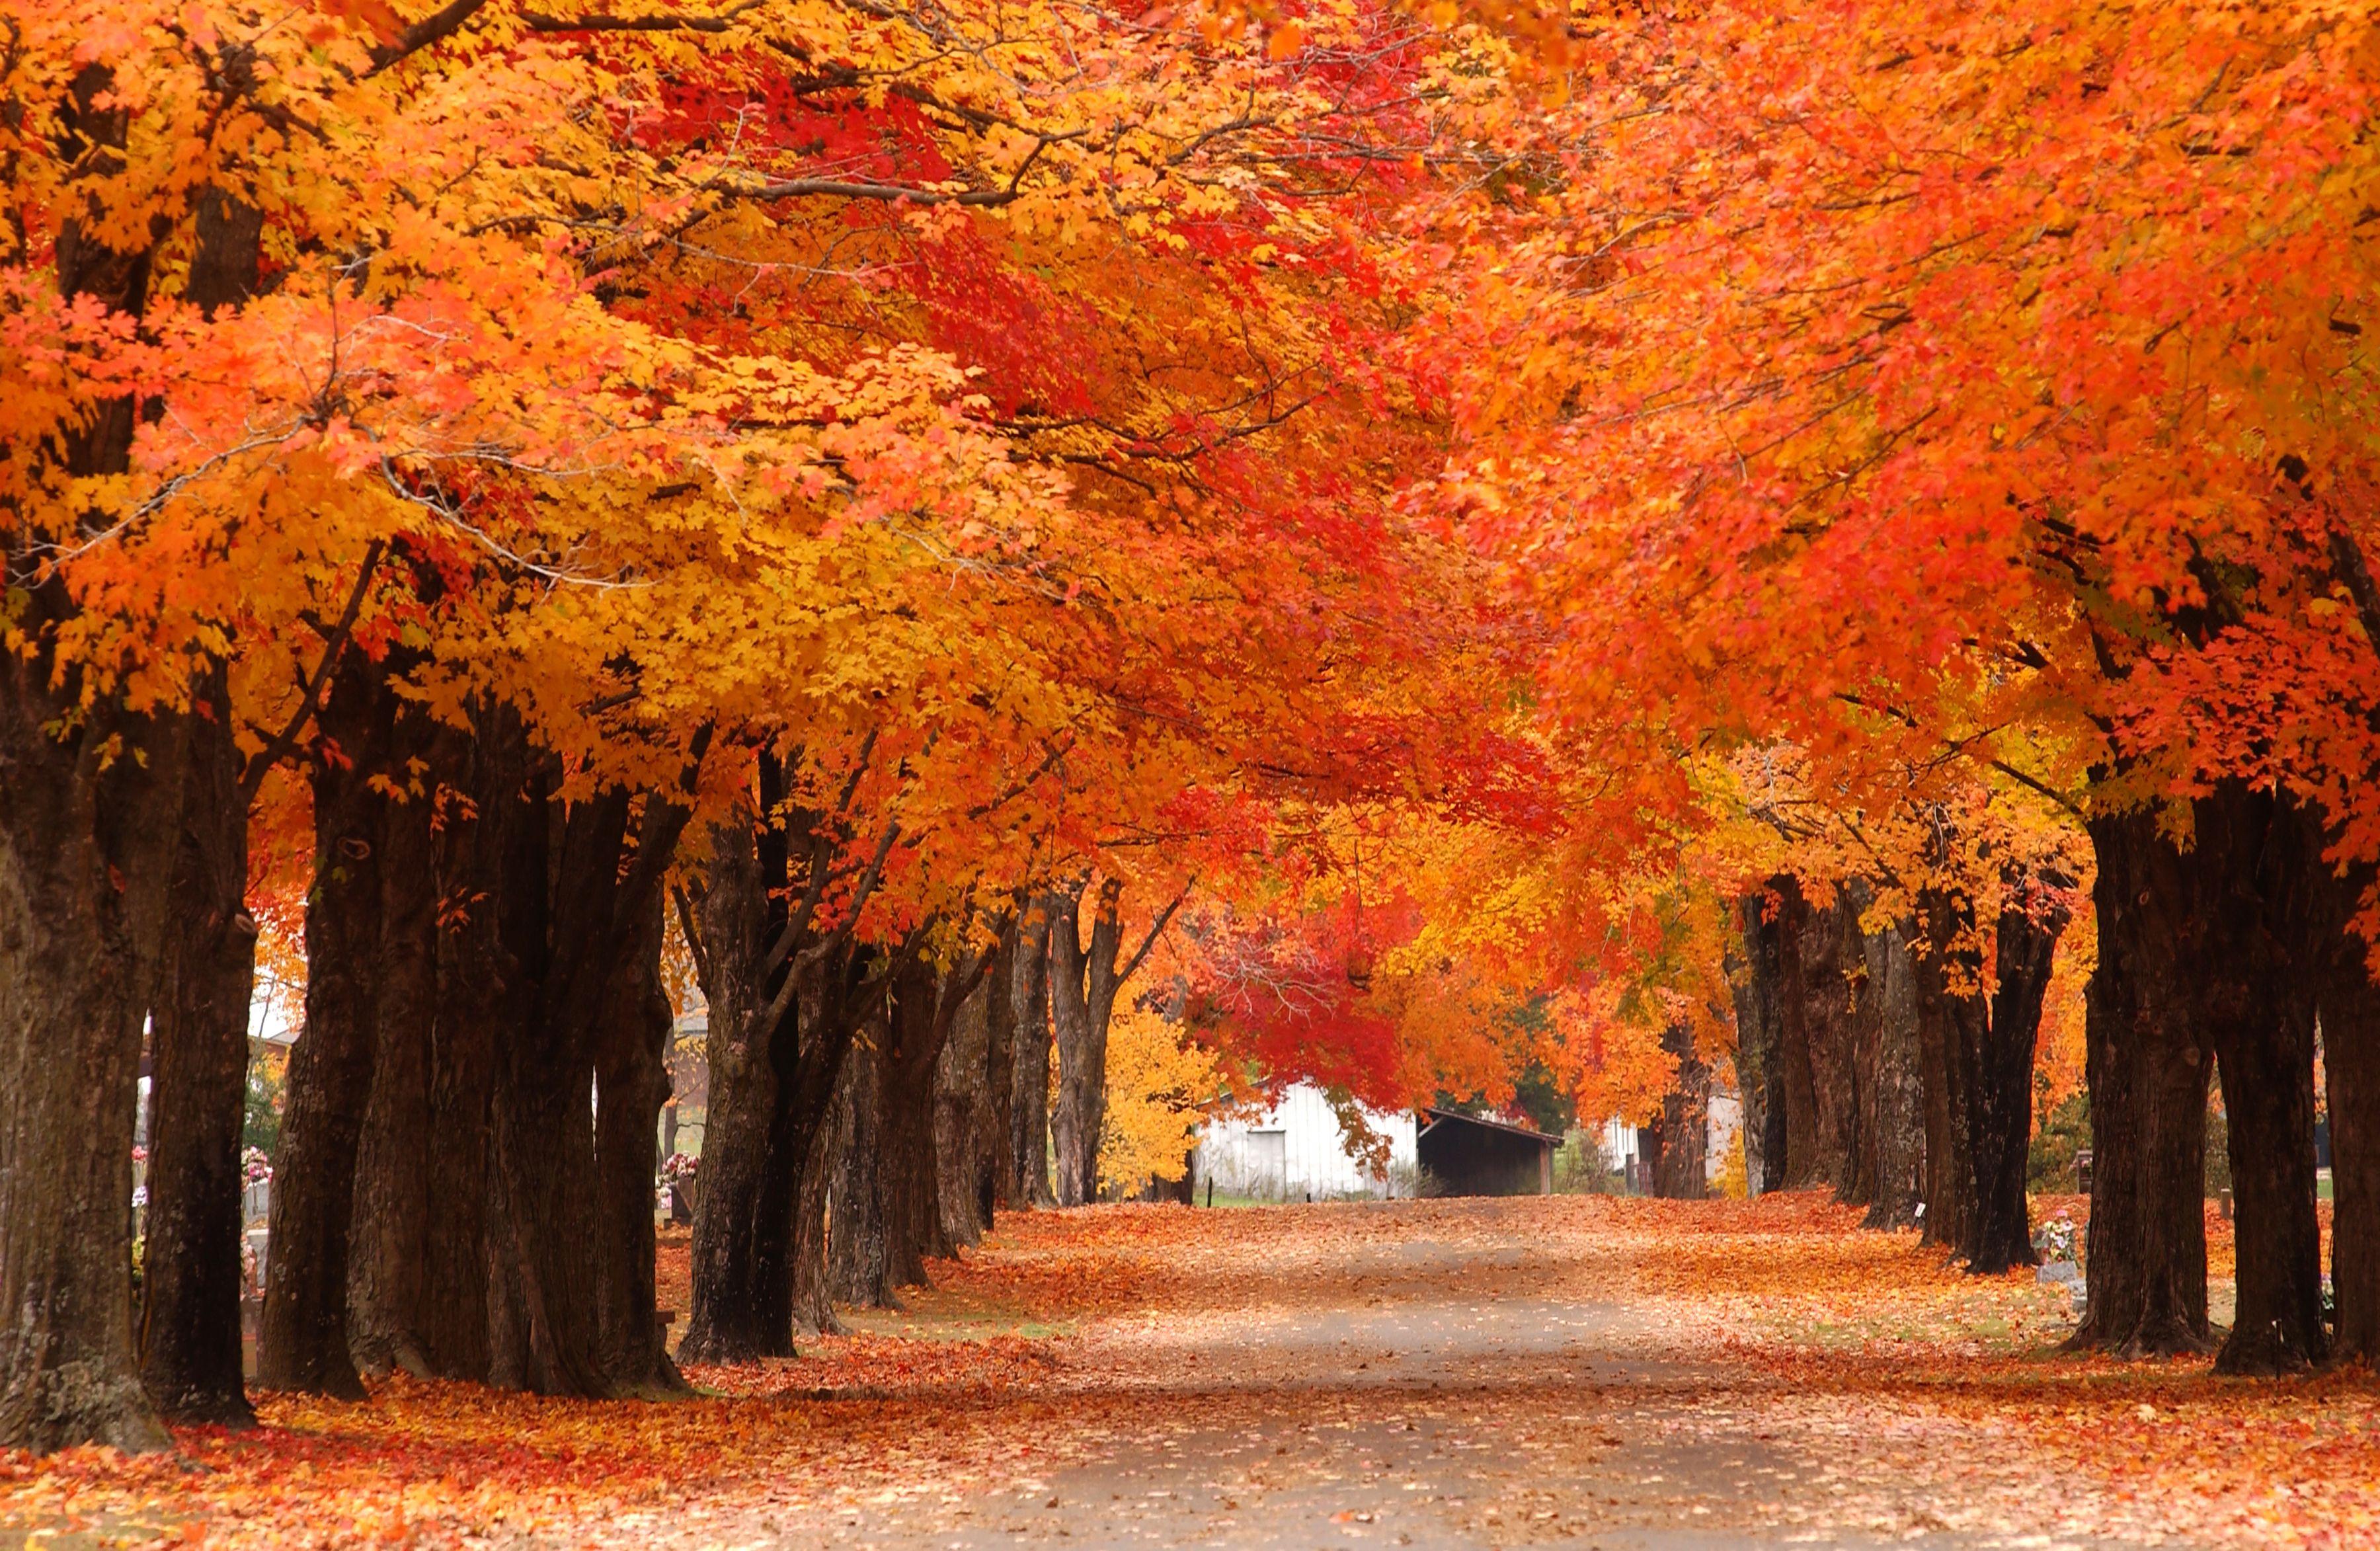 roads  traveled     scenic drives 3600 x 2346 · jpeg